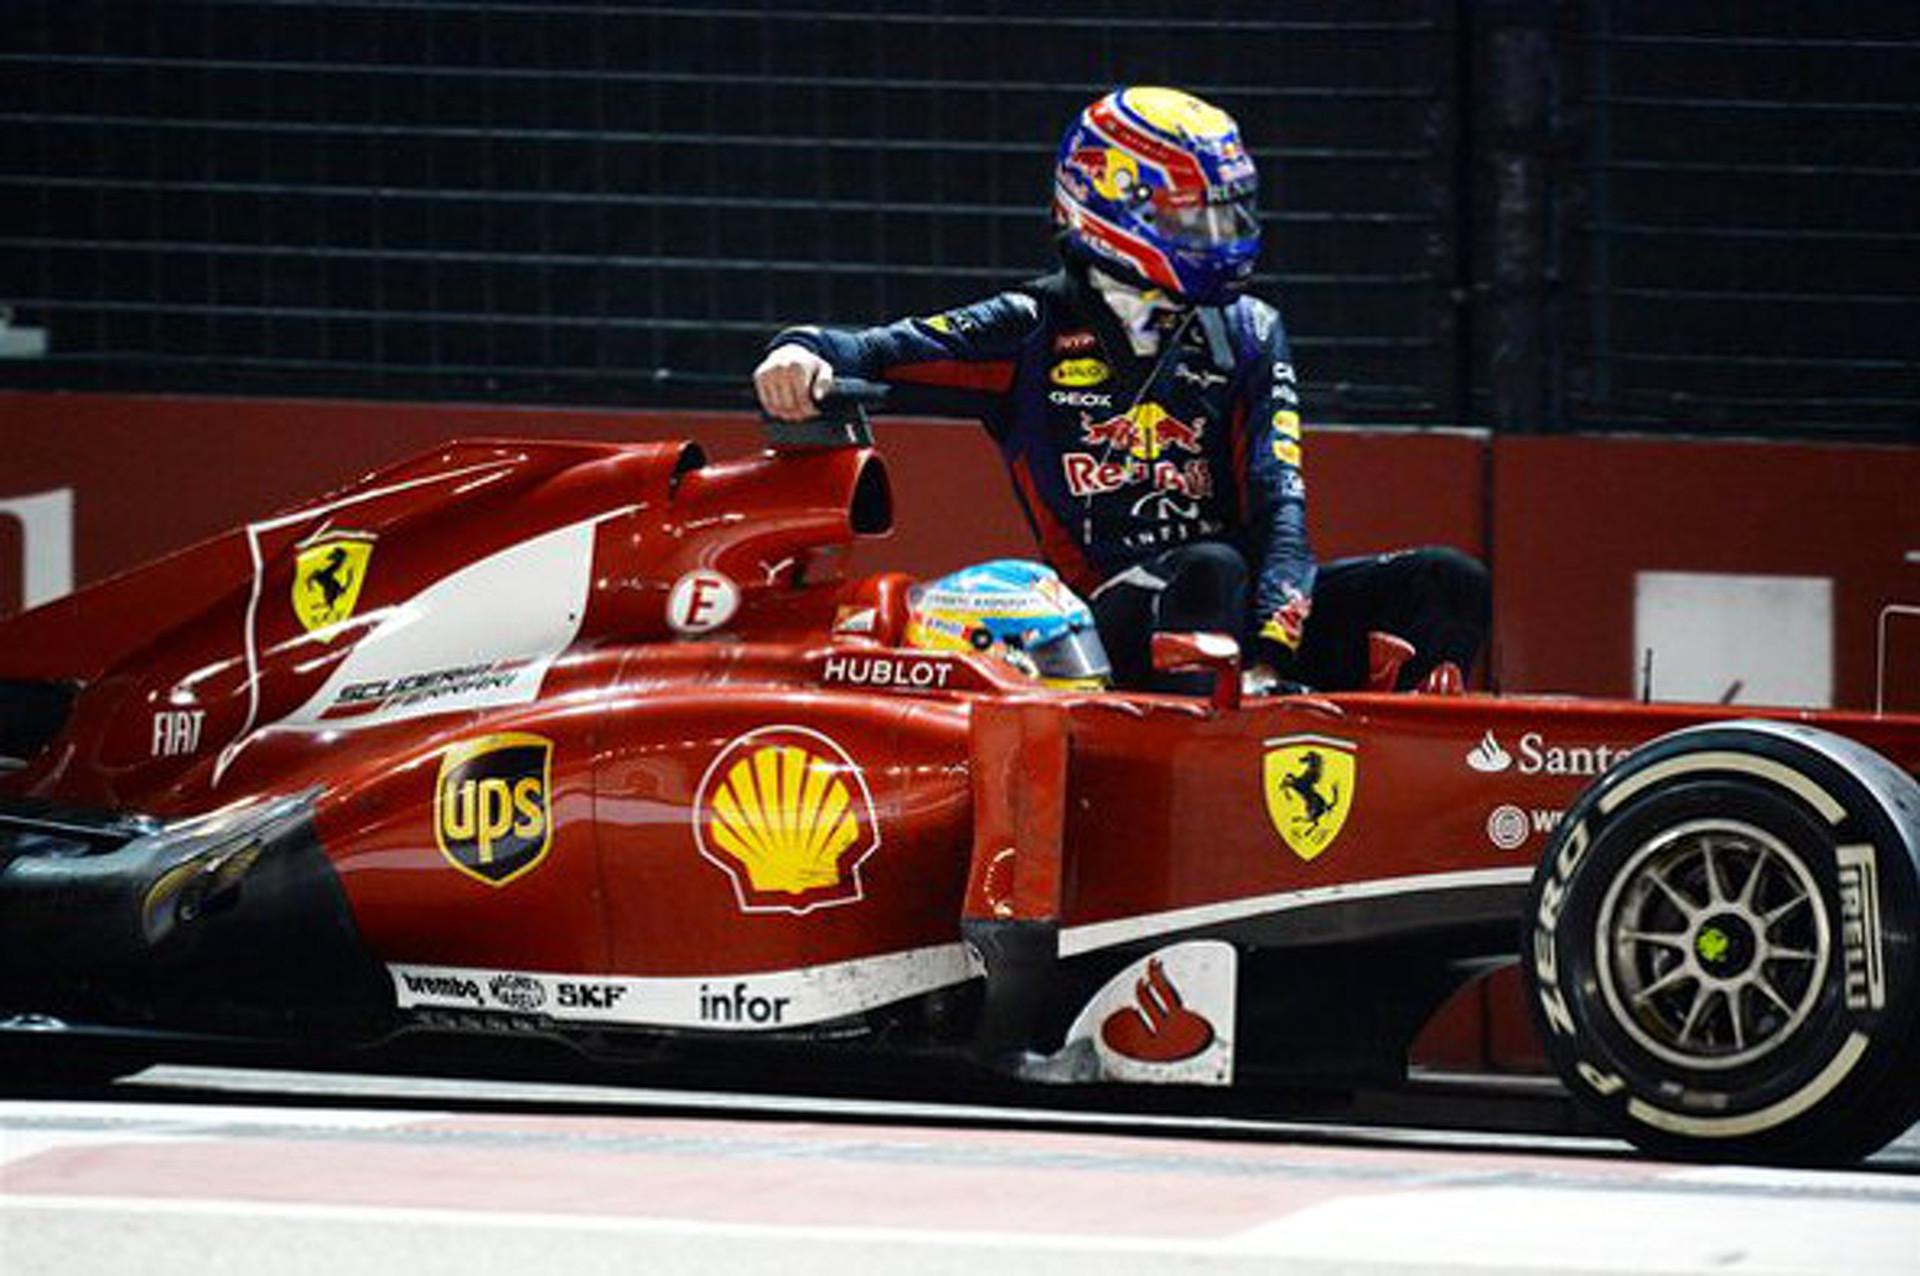 F1 Driver Picks Up 'Hitchhiker' at Singapore GP [w/video]